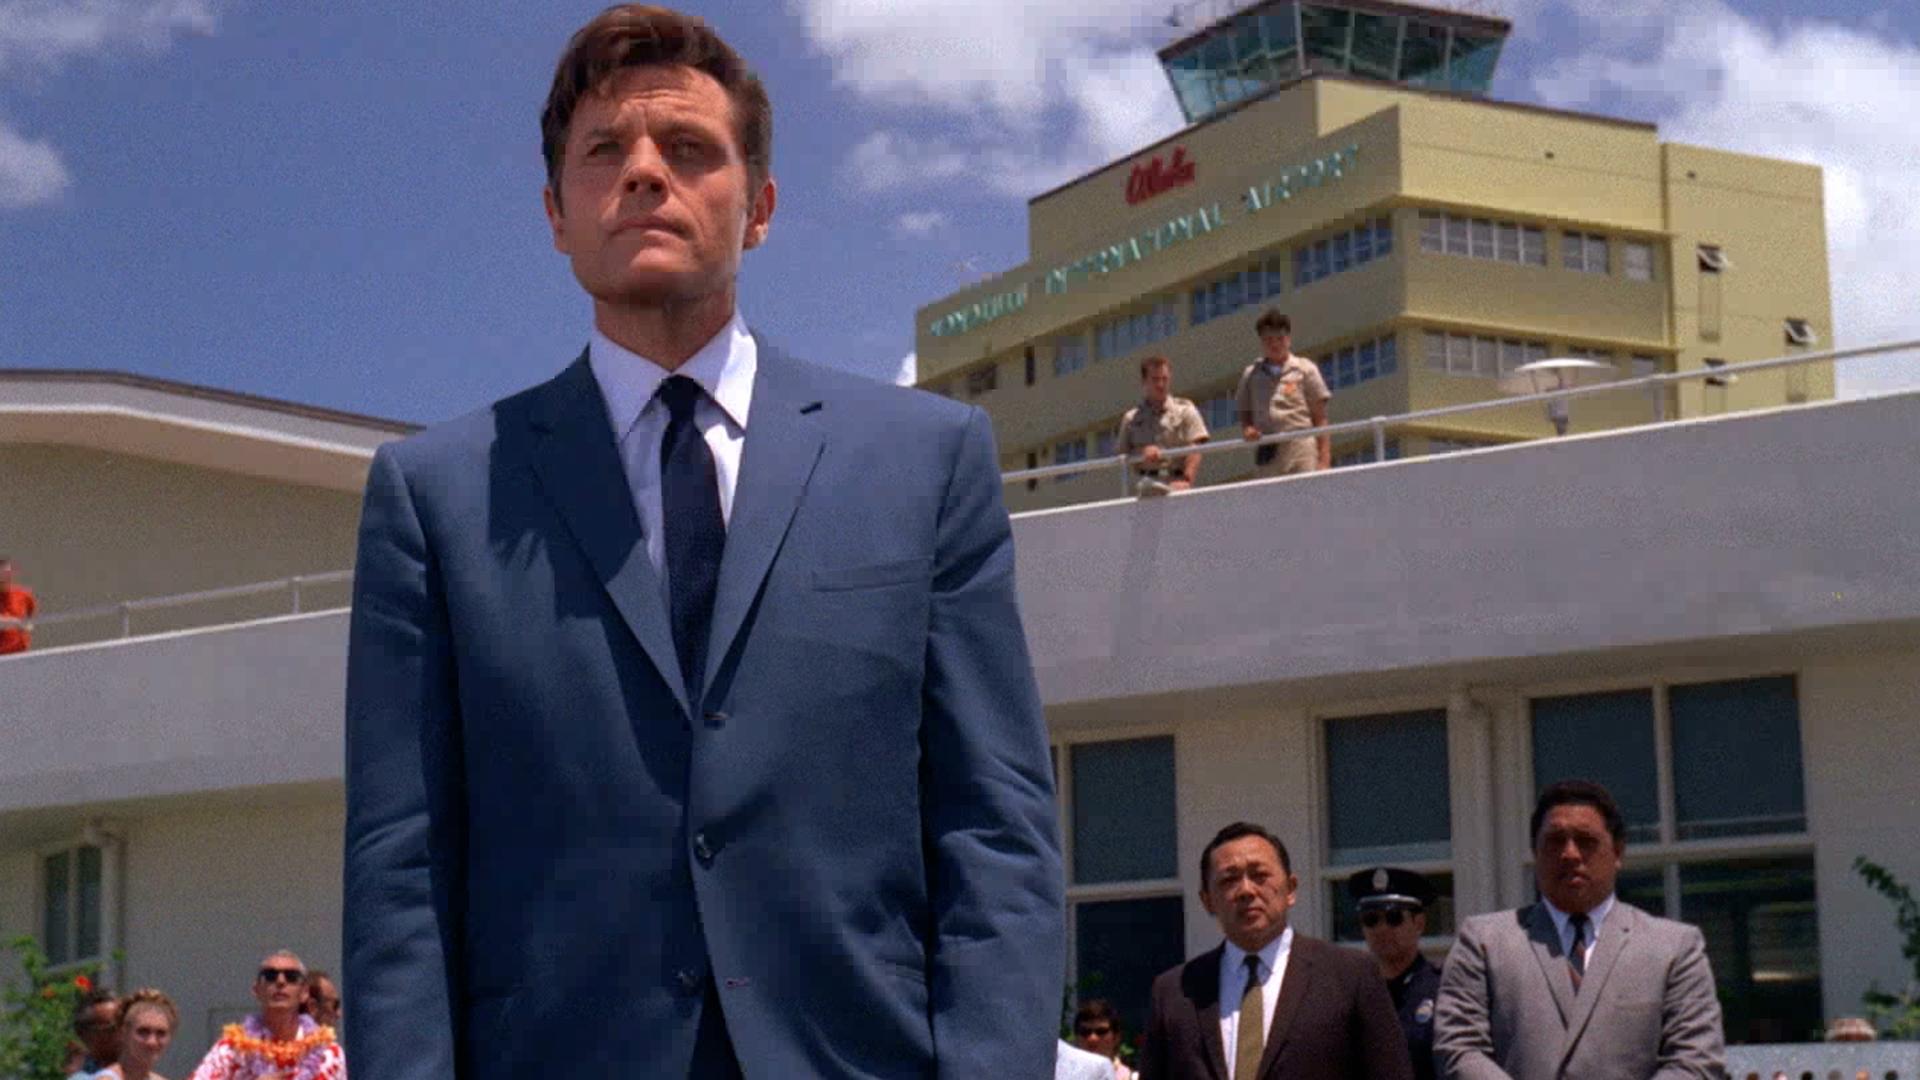 hawaii five o season 1 episode 11 watch online